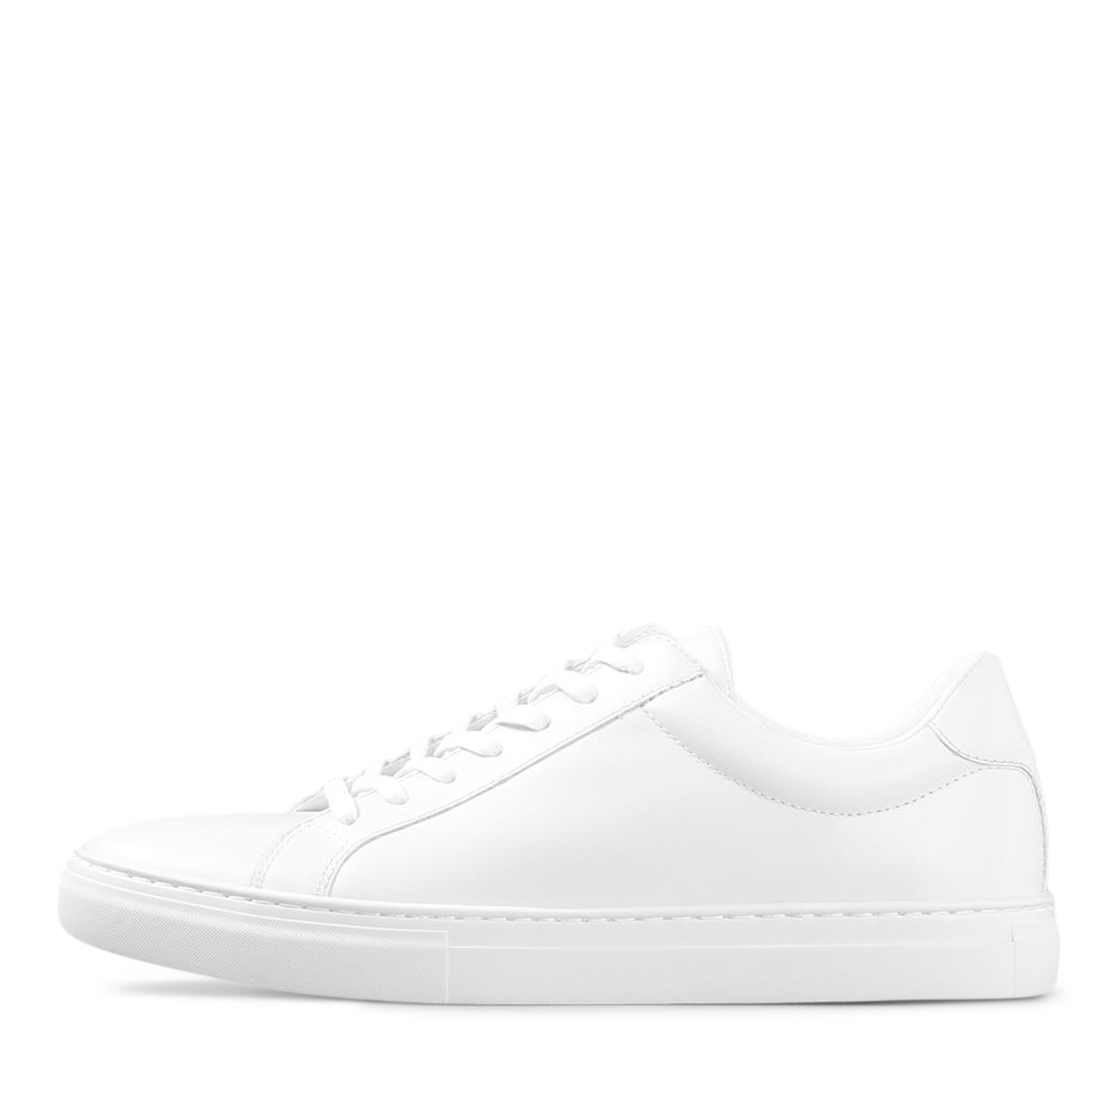 Vagabond Paul sneaker